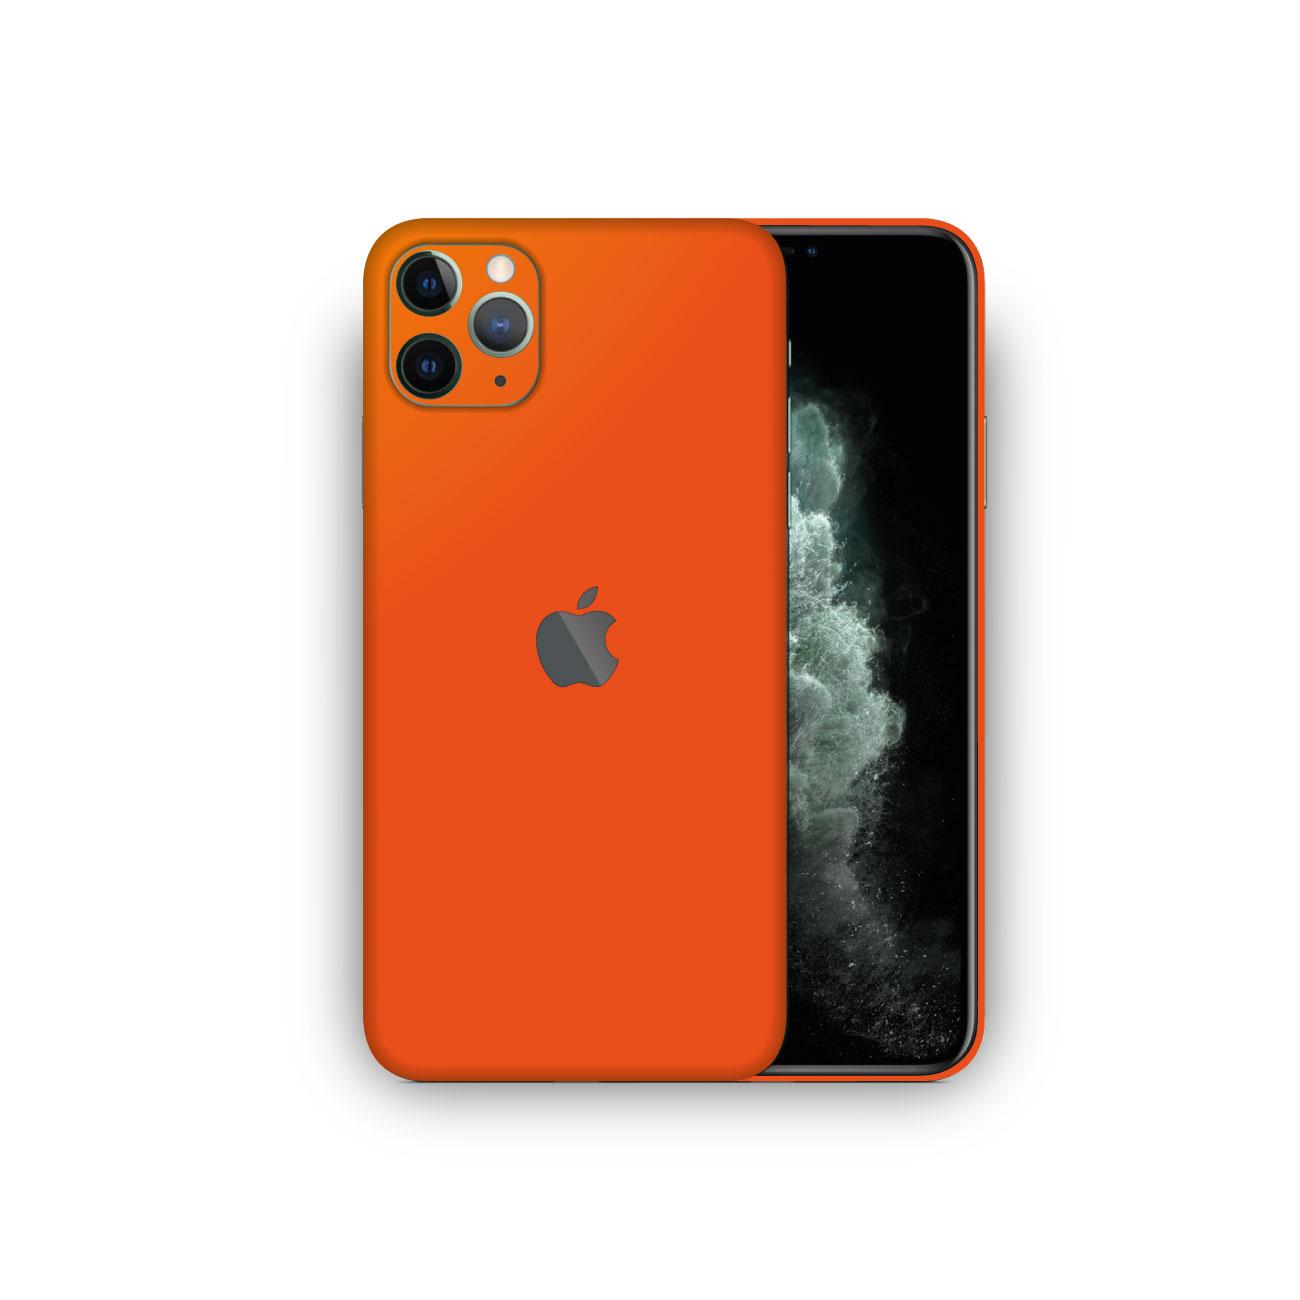 Apple iPhone 11 Pro MATTE ORANGE Skin Vinyl Wrap